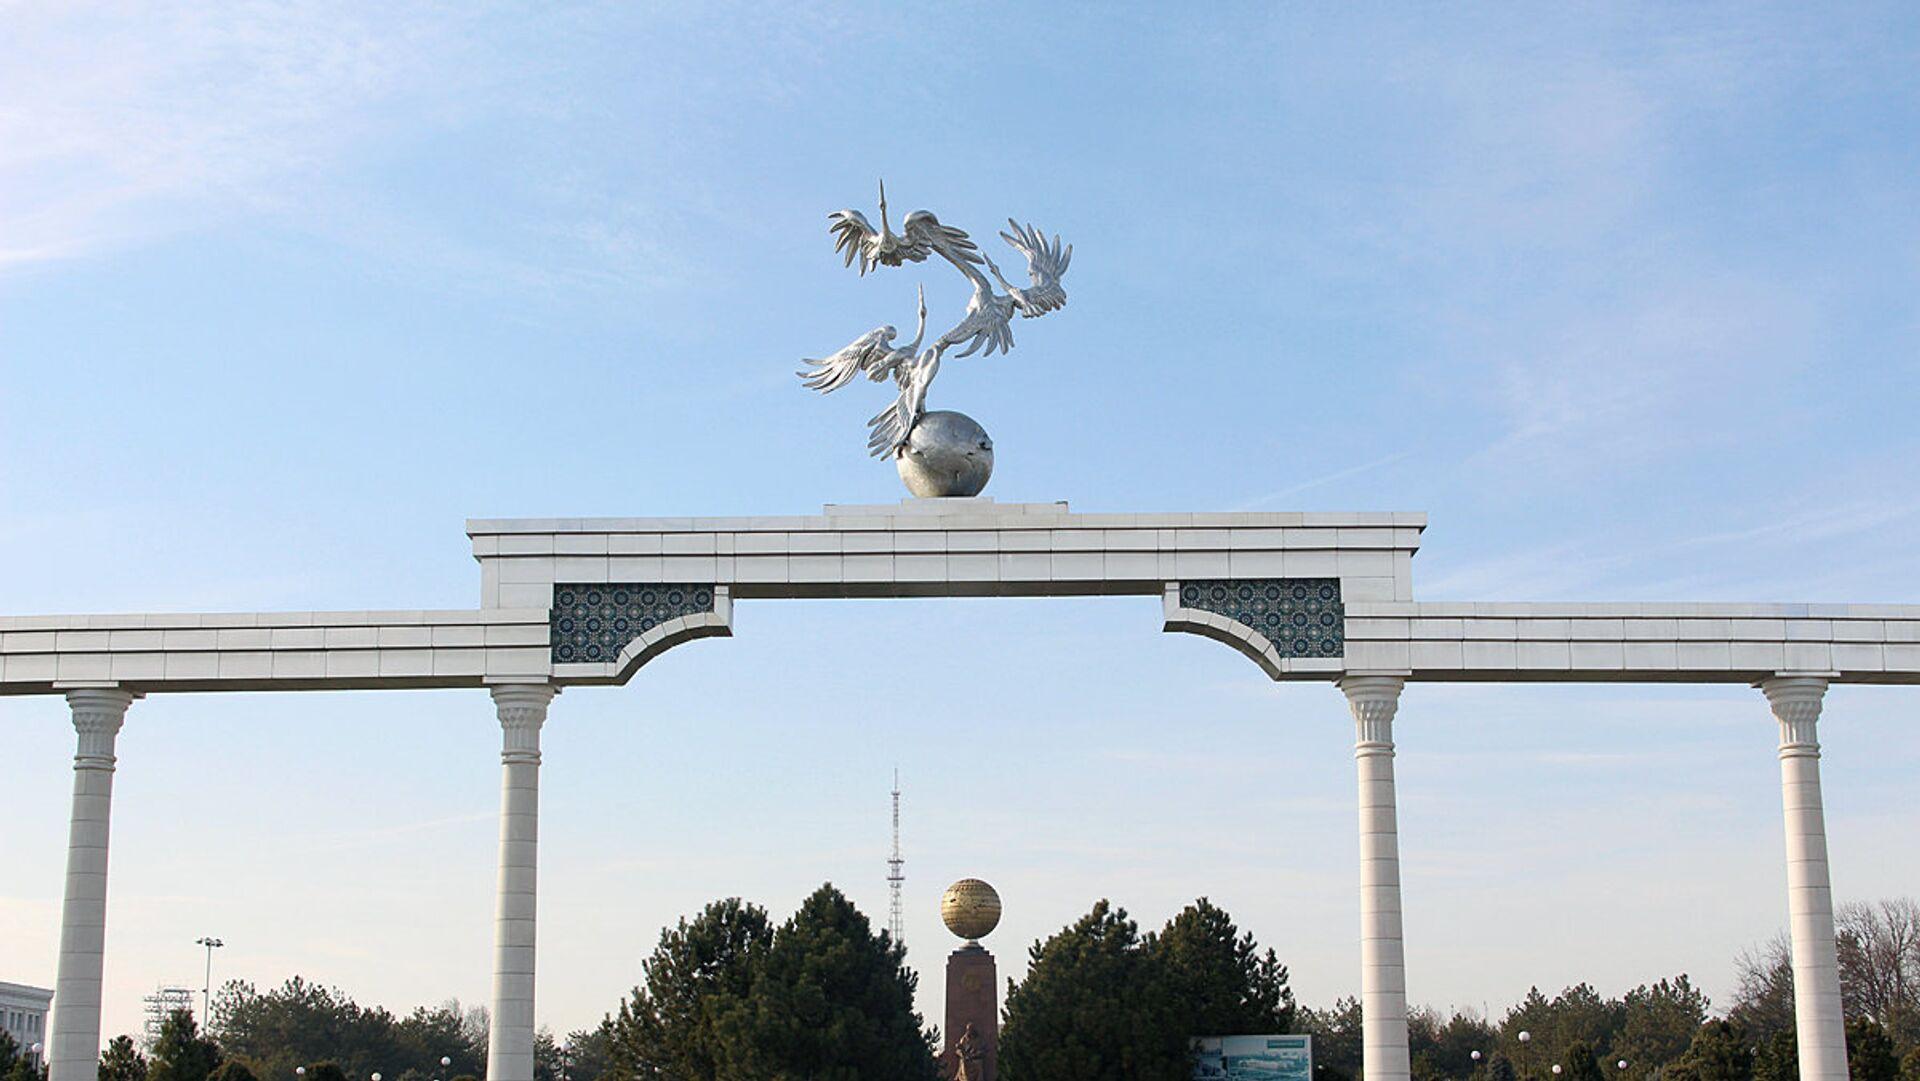 Площадь Независимости - Sputnik Ўзбекистон, 1920, 08.03.2021